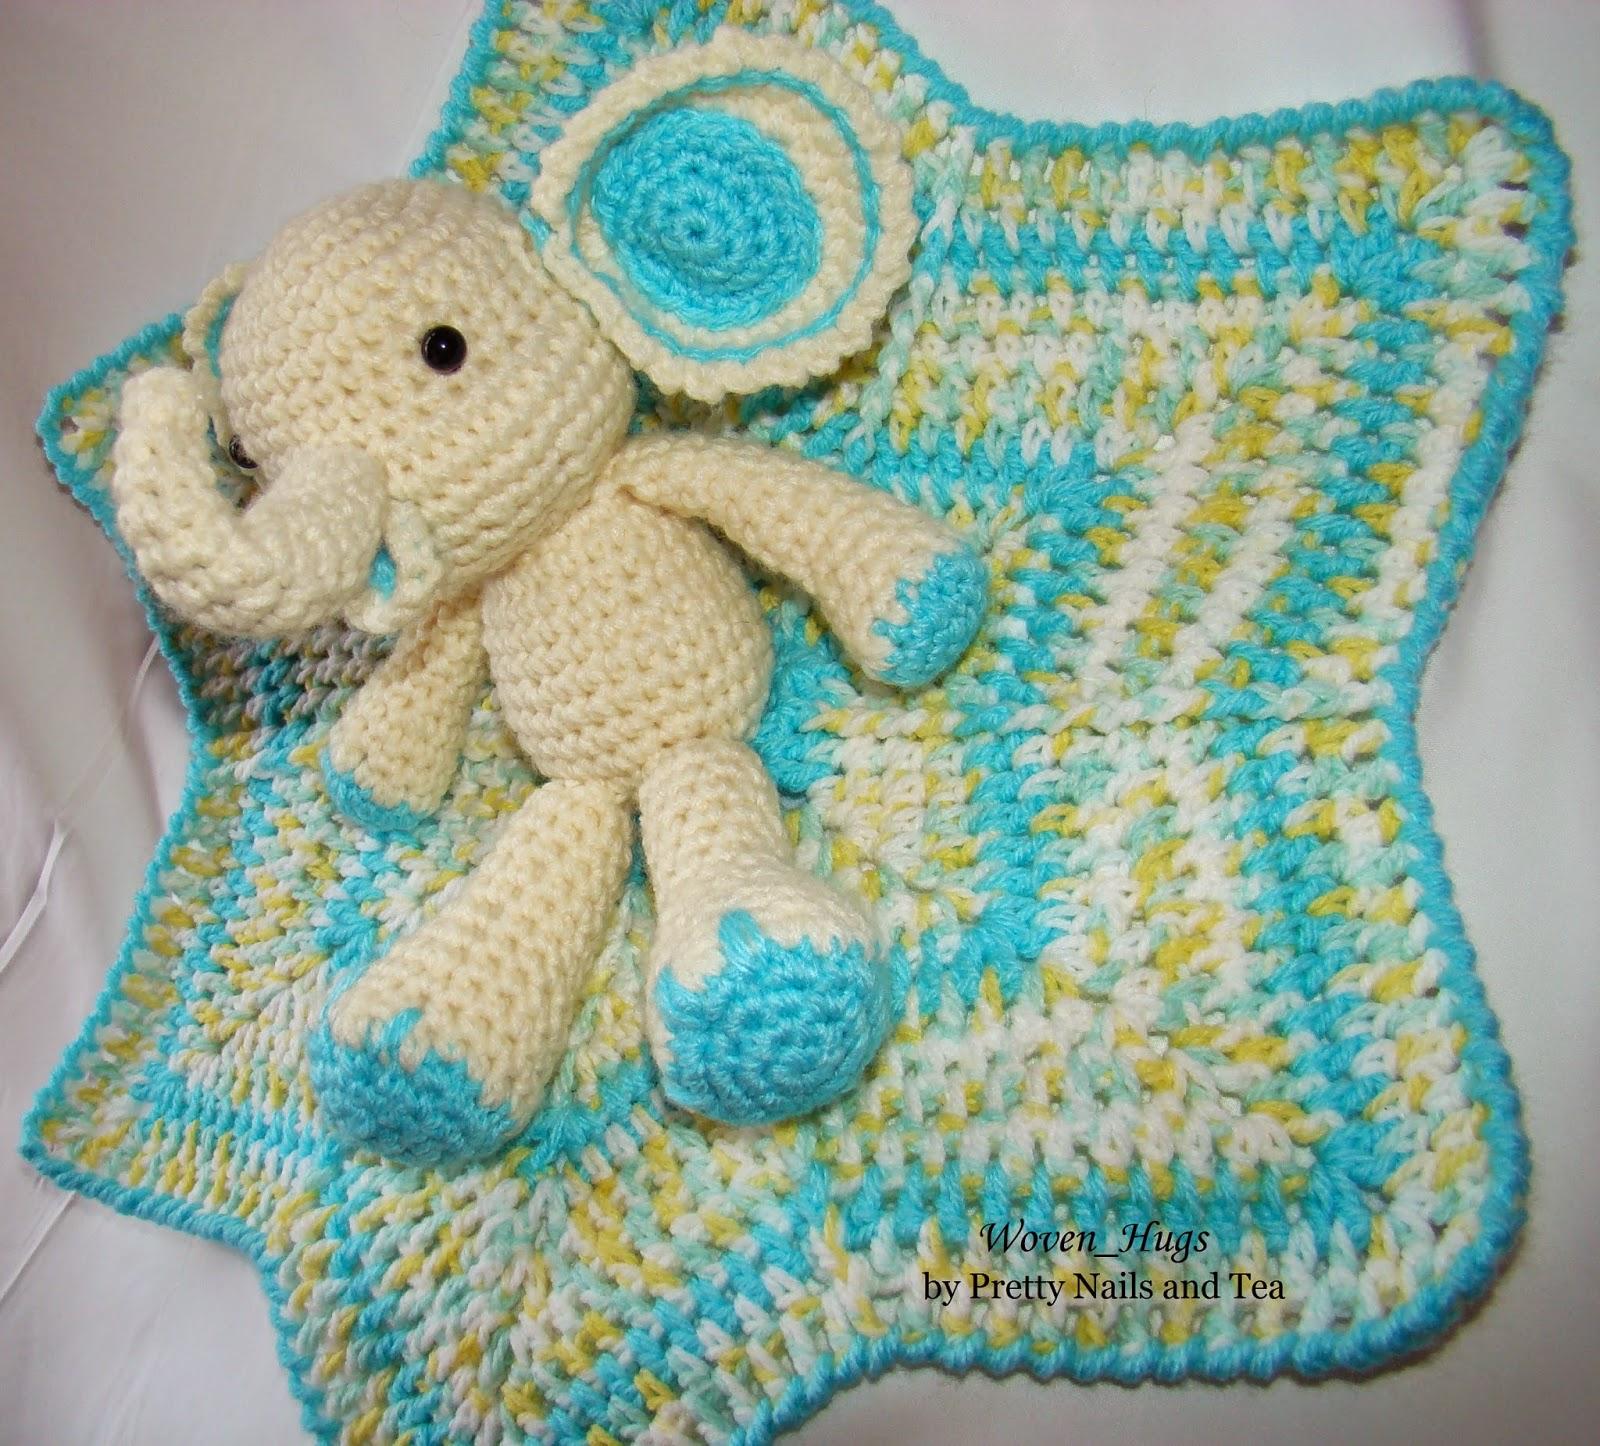 ... : Baby Halik - Star Baby Blankie 2: No Ruffles Free Crochet Pattern